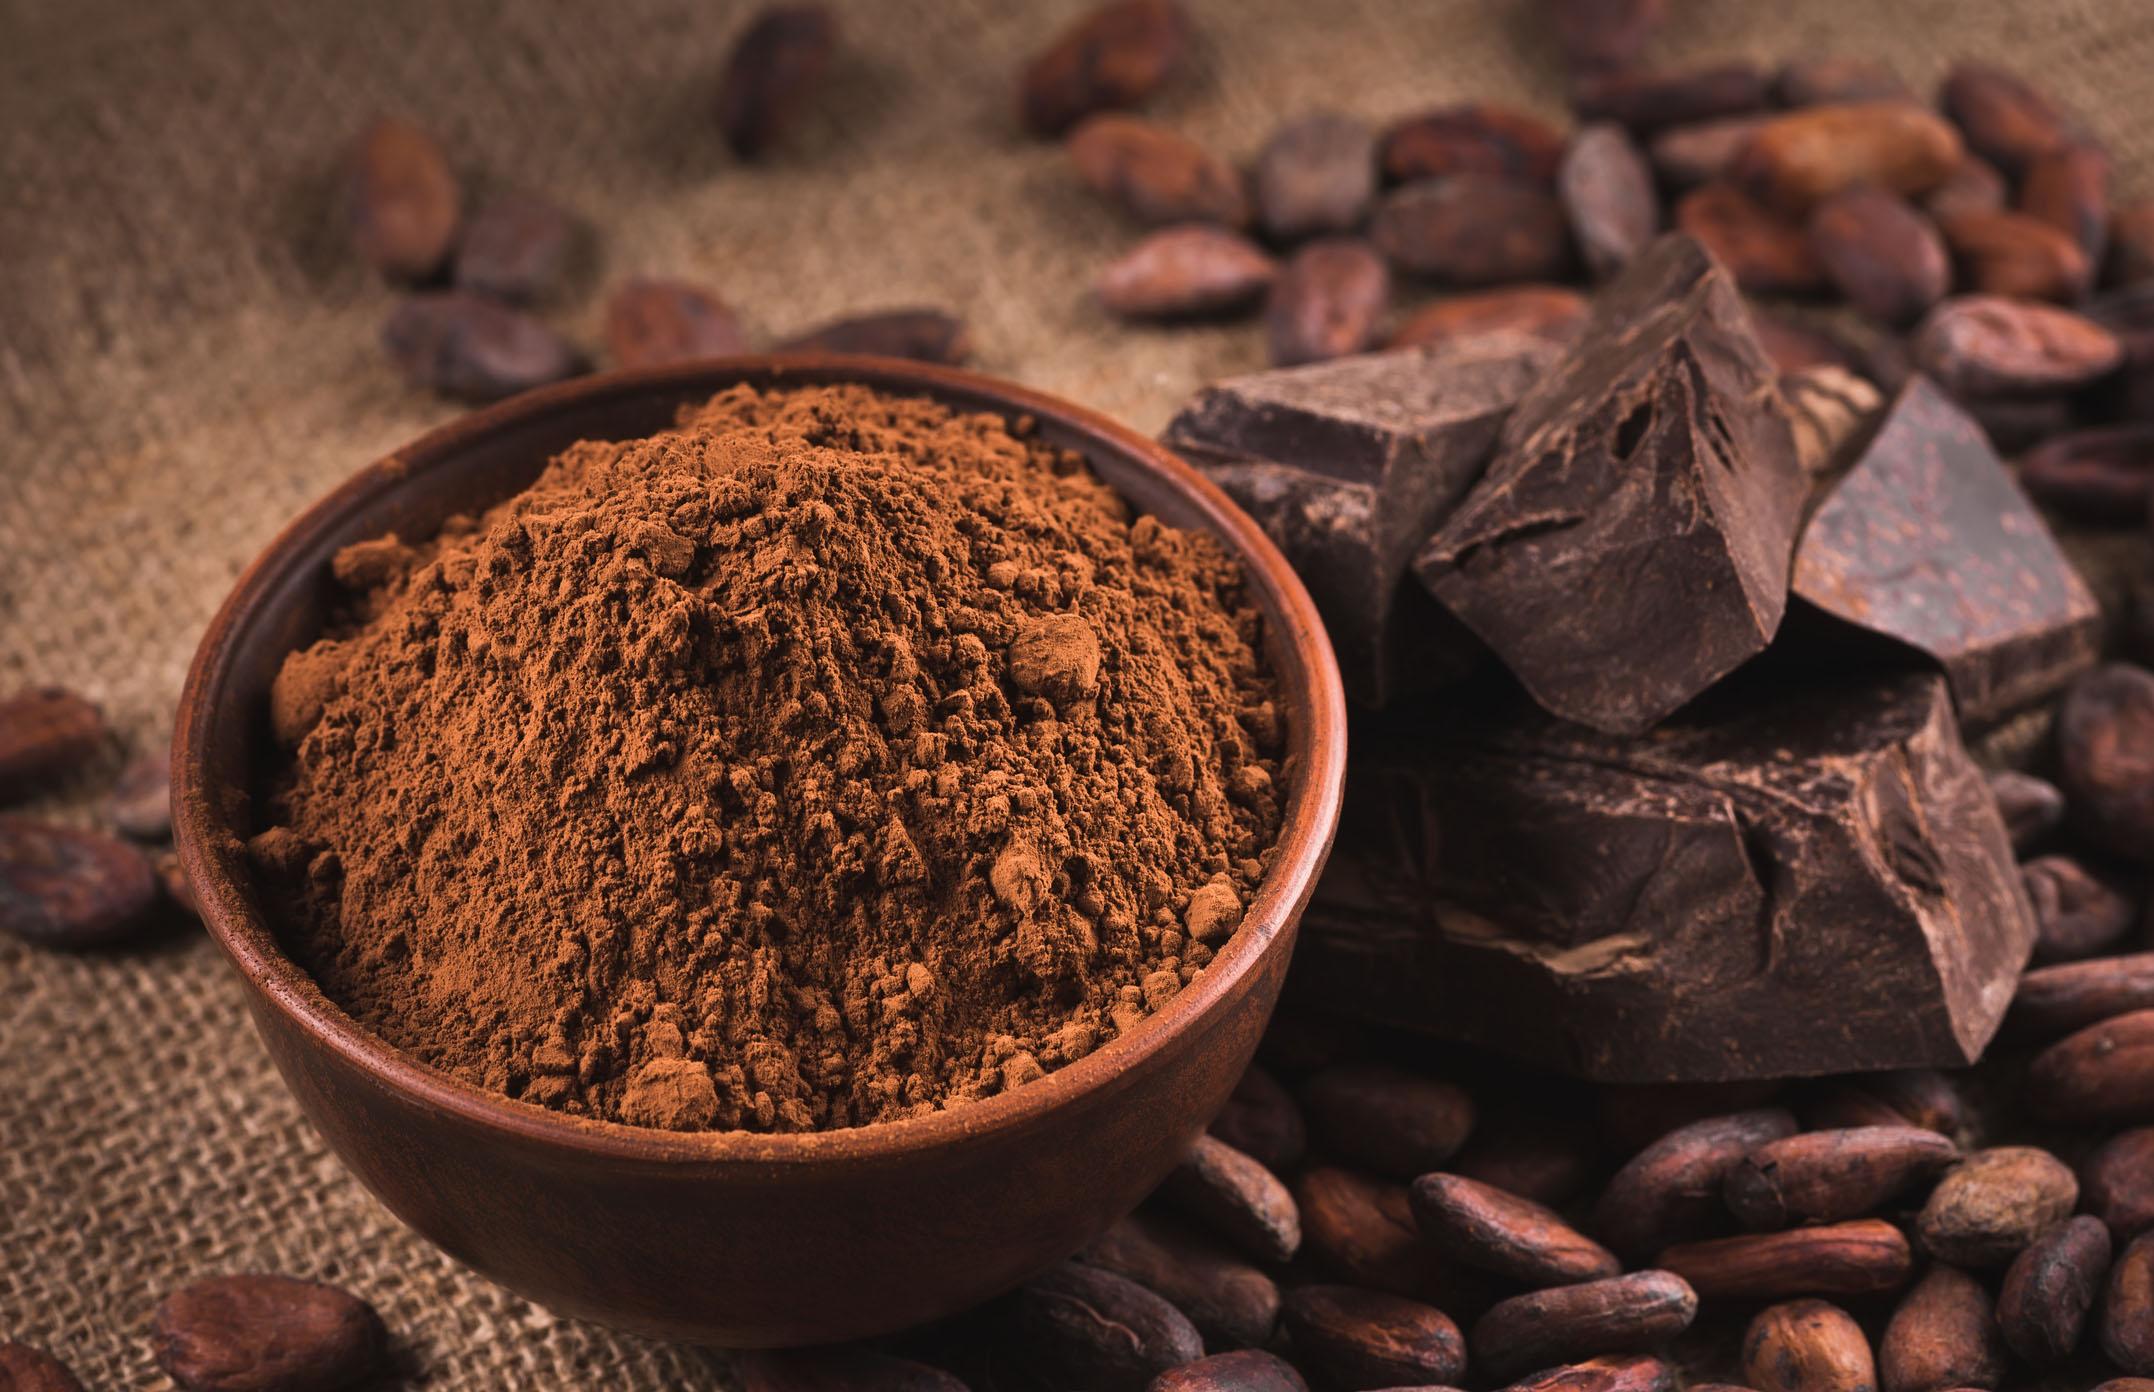 Cocoa powder, cocoa beans, and dark chocolate bars